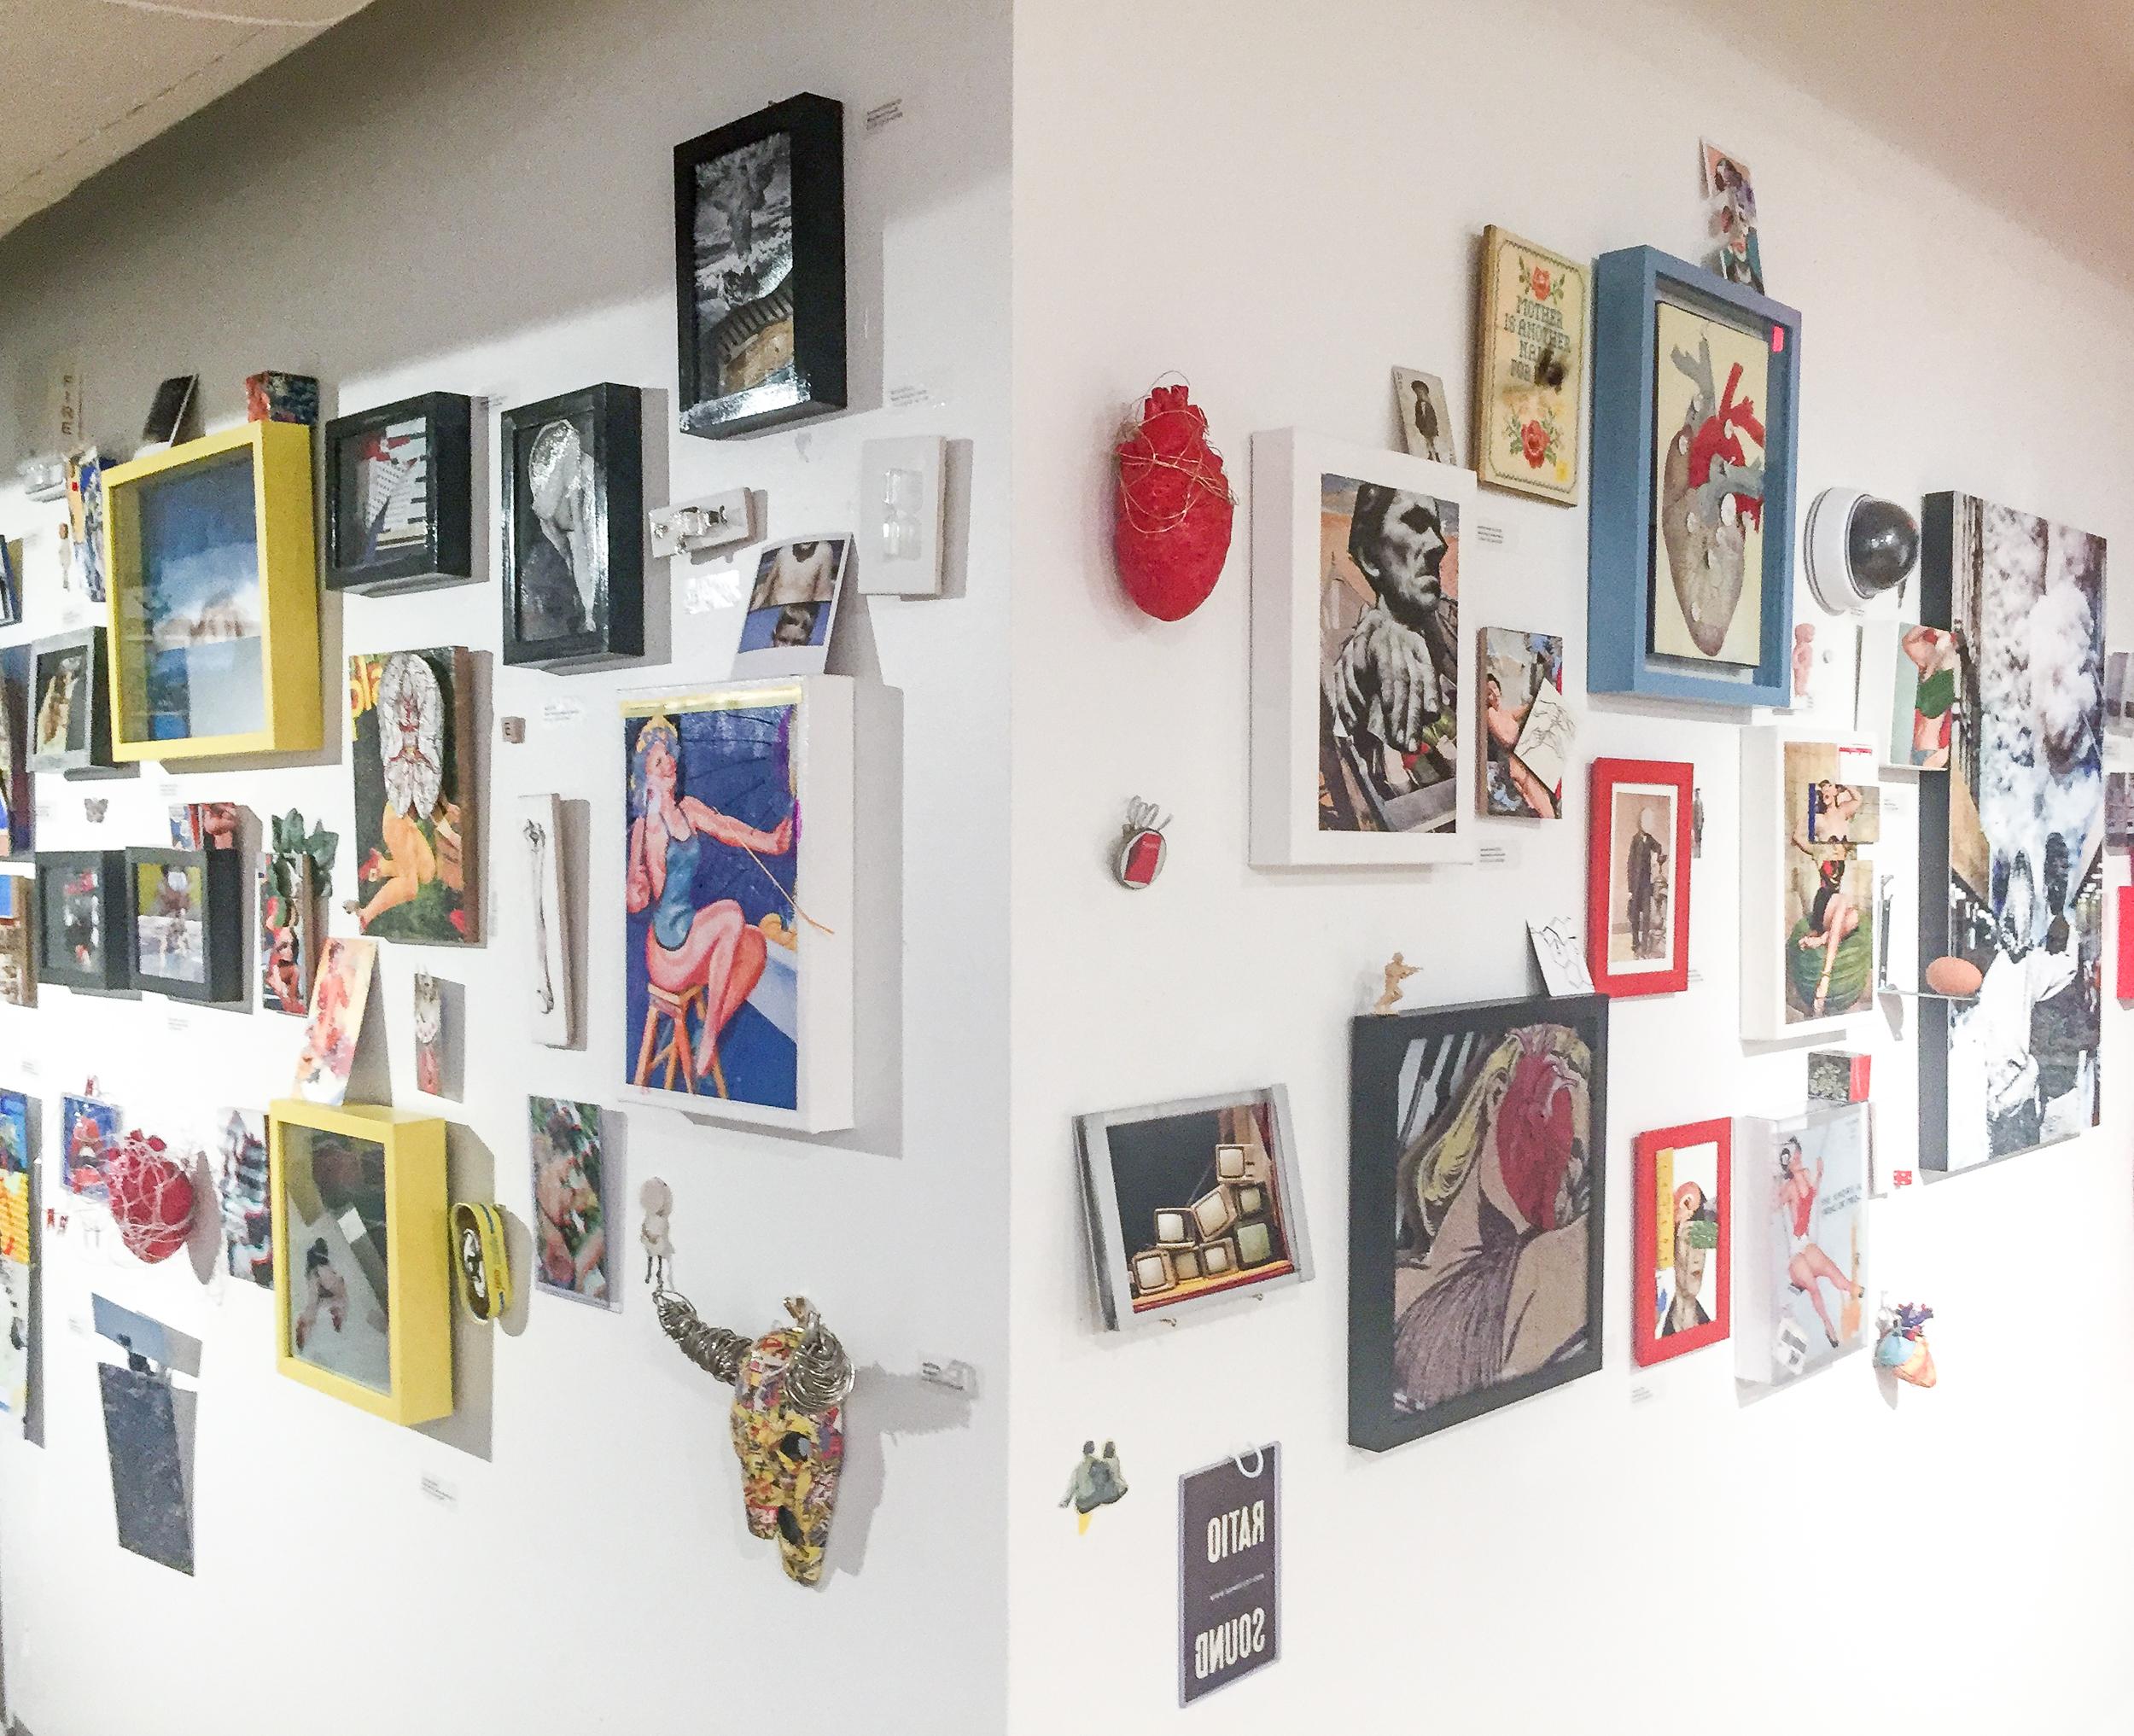 Faena-Exhibition-Images-11.jpg